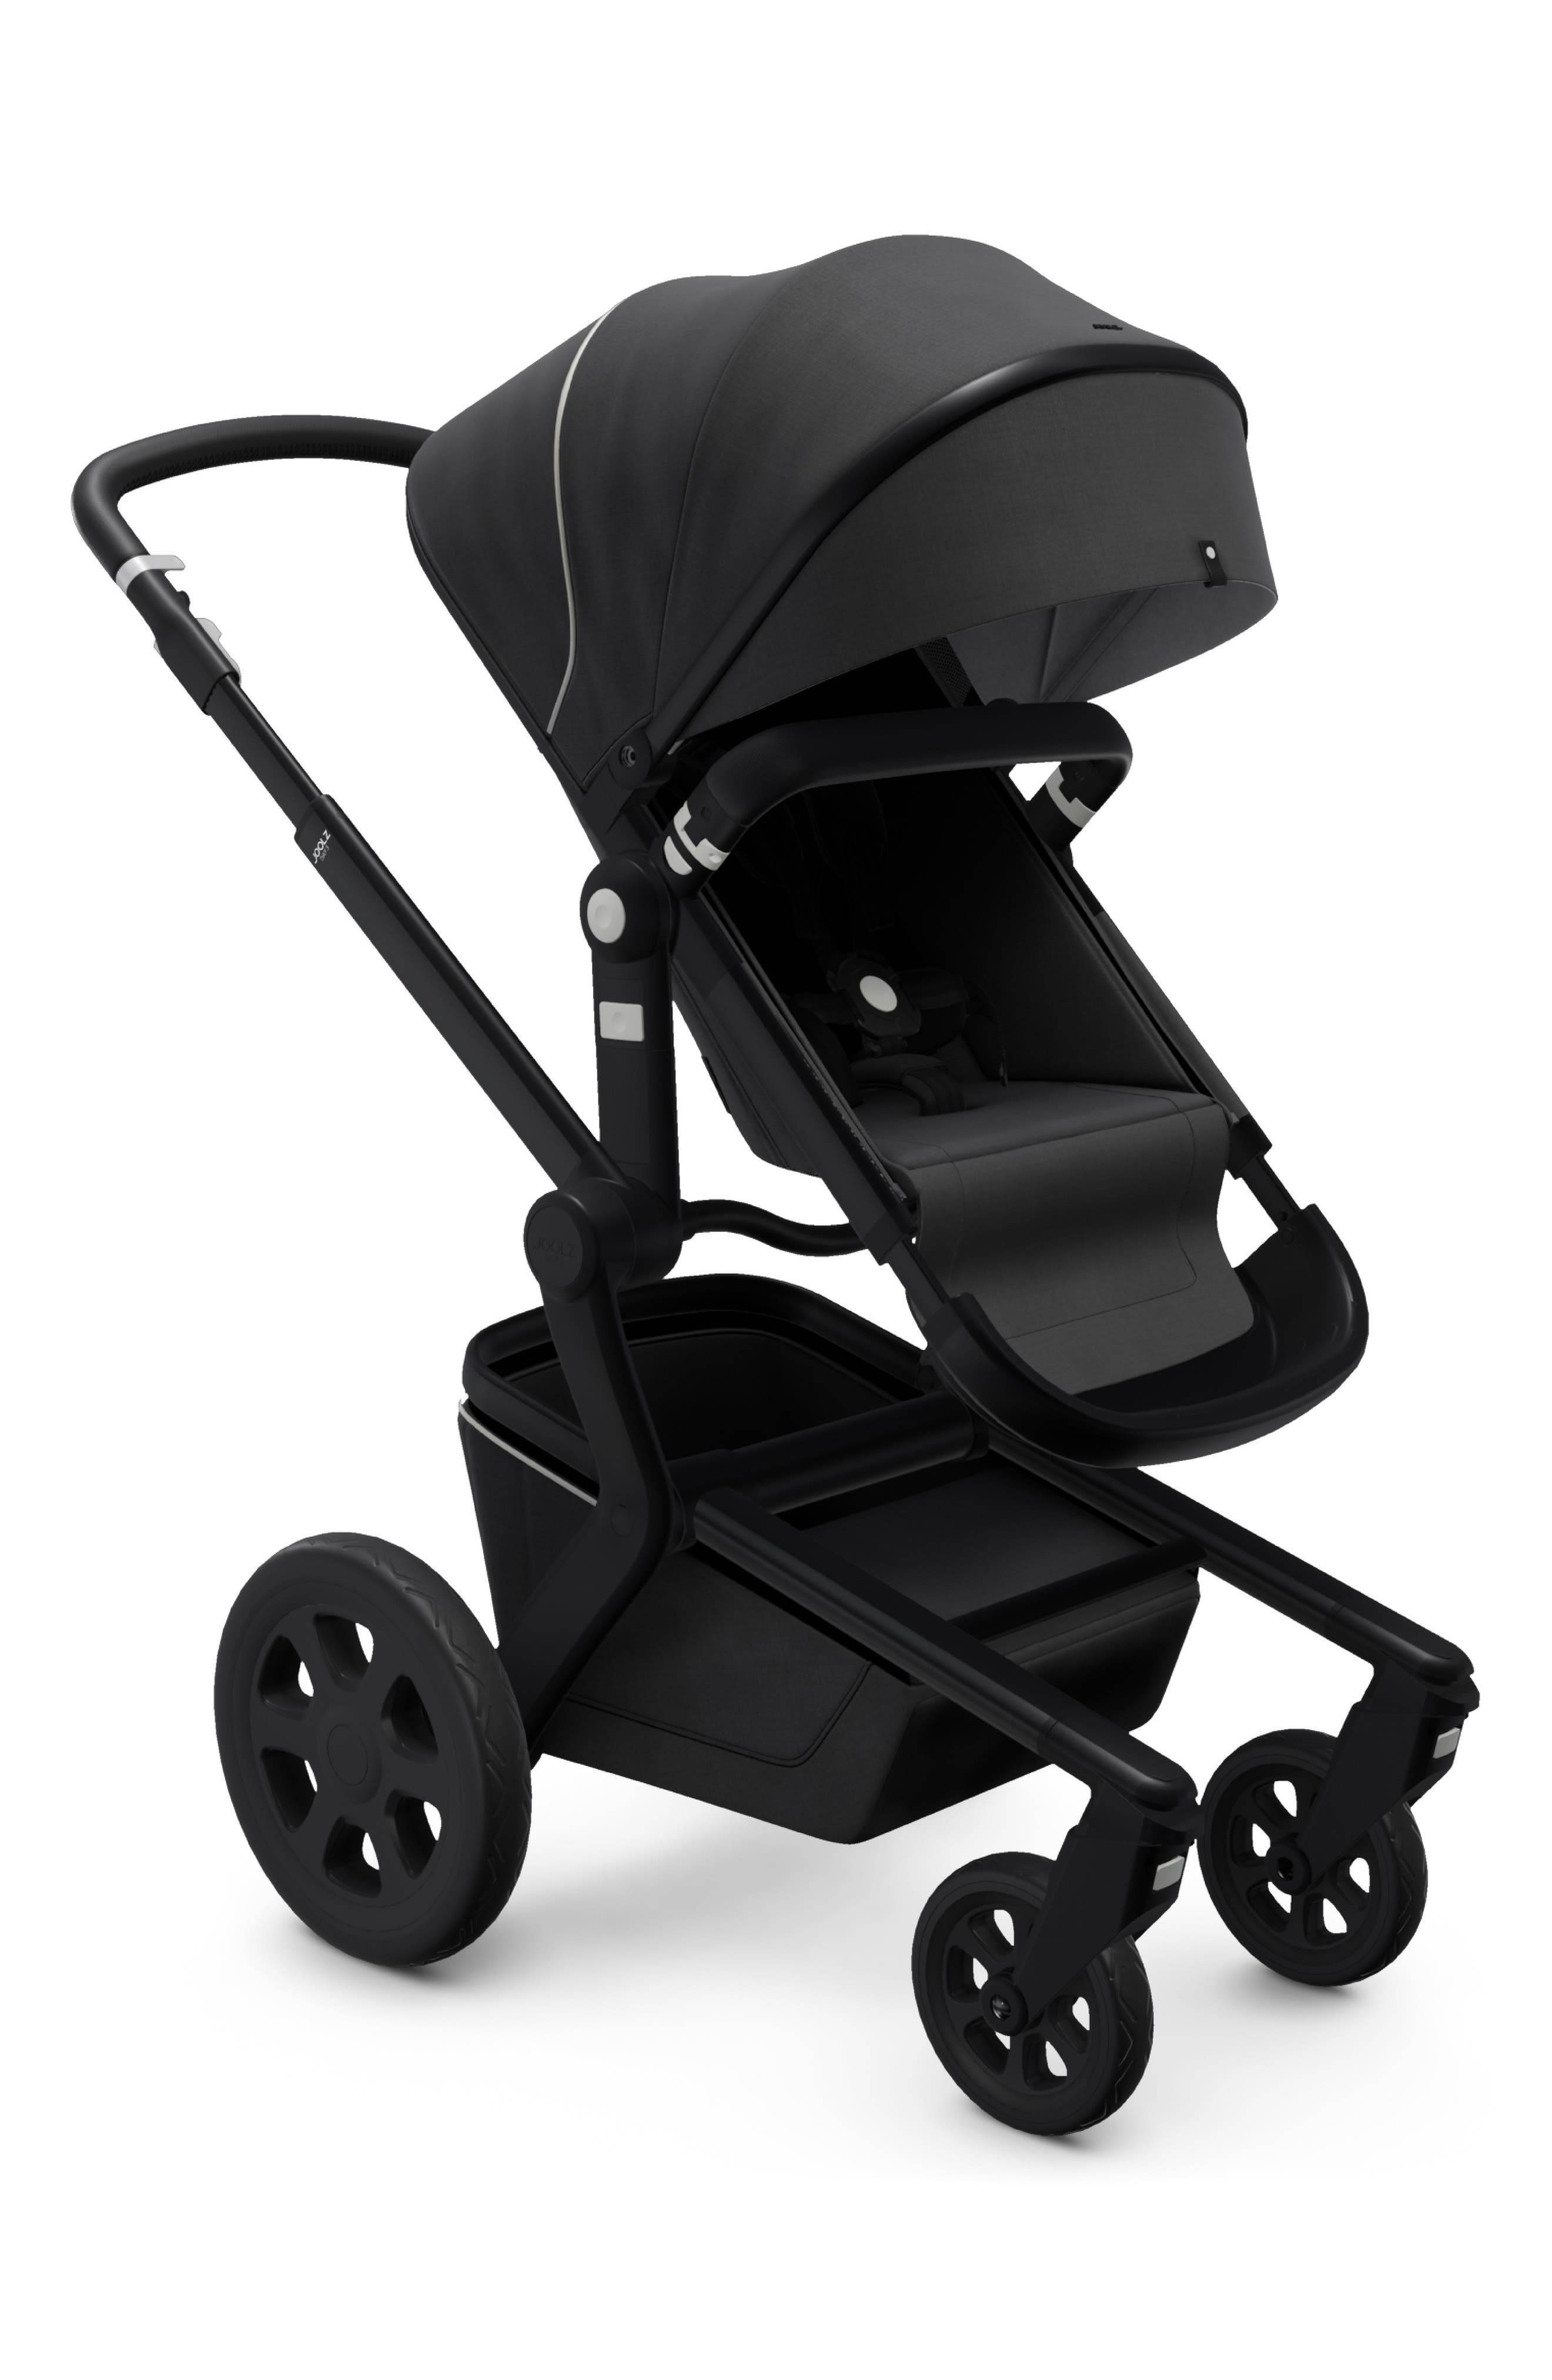 Joolz Infant Joolz Day3 Reflective Stroller & Bassinet, Size One Size - Black